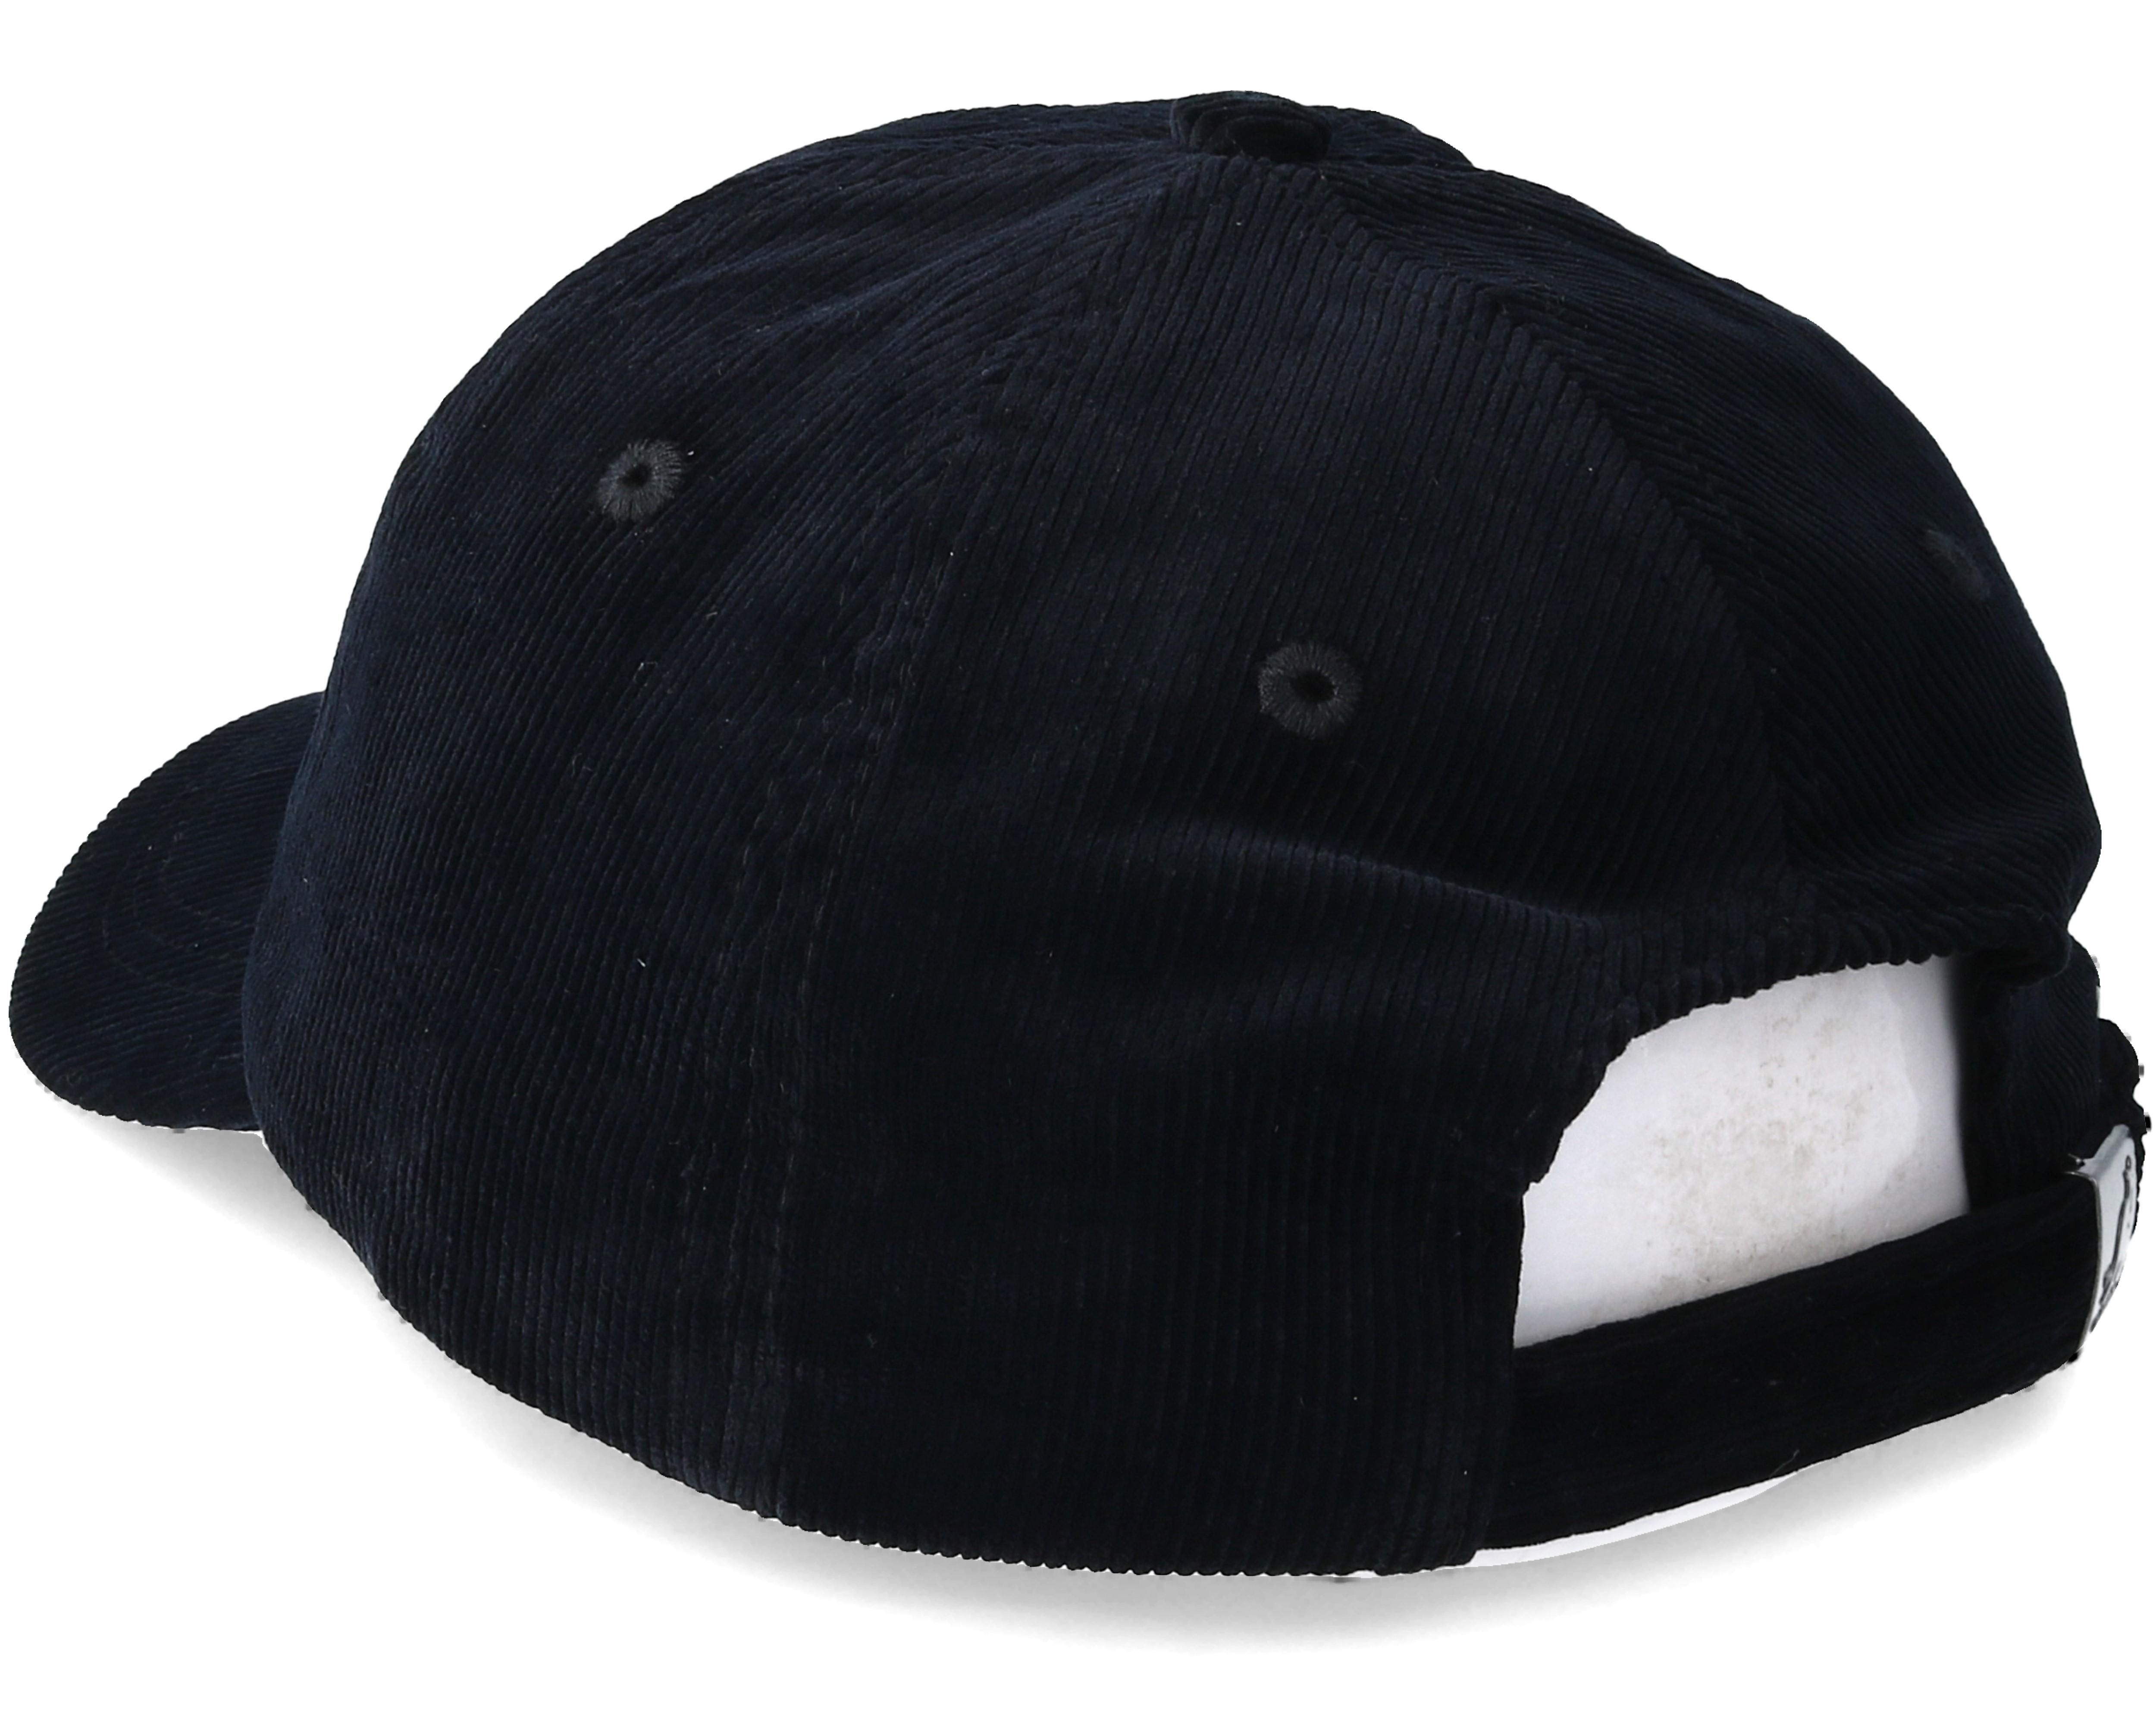 Oakley Det Cord >> Cord Baseball Black adjustable - Kangol cap - Hatstore.de